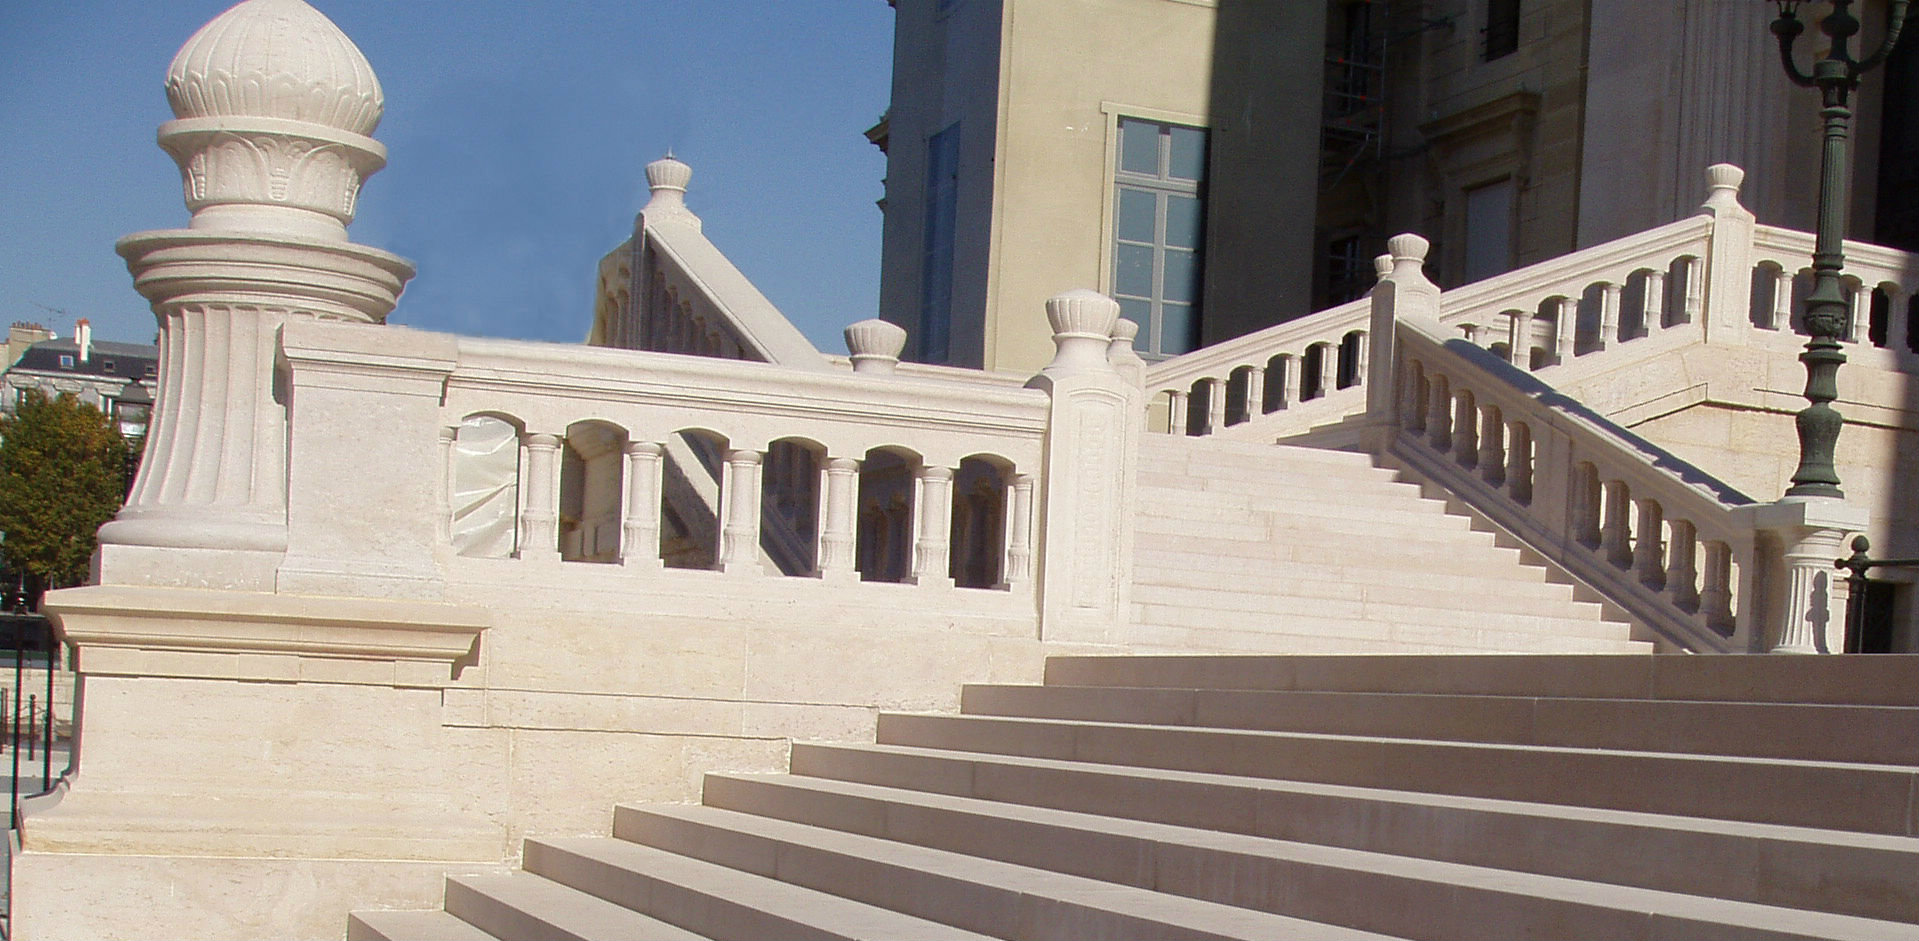 Escalier massif palais de justice de Paris en comblanchien